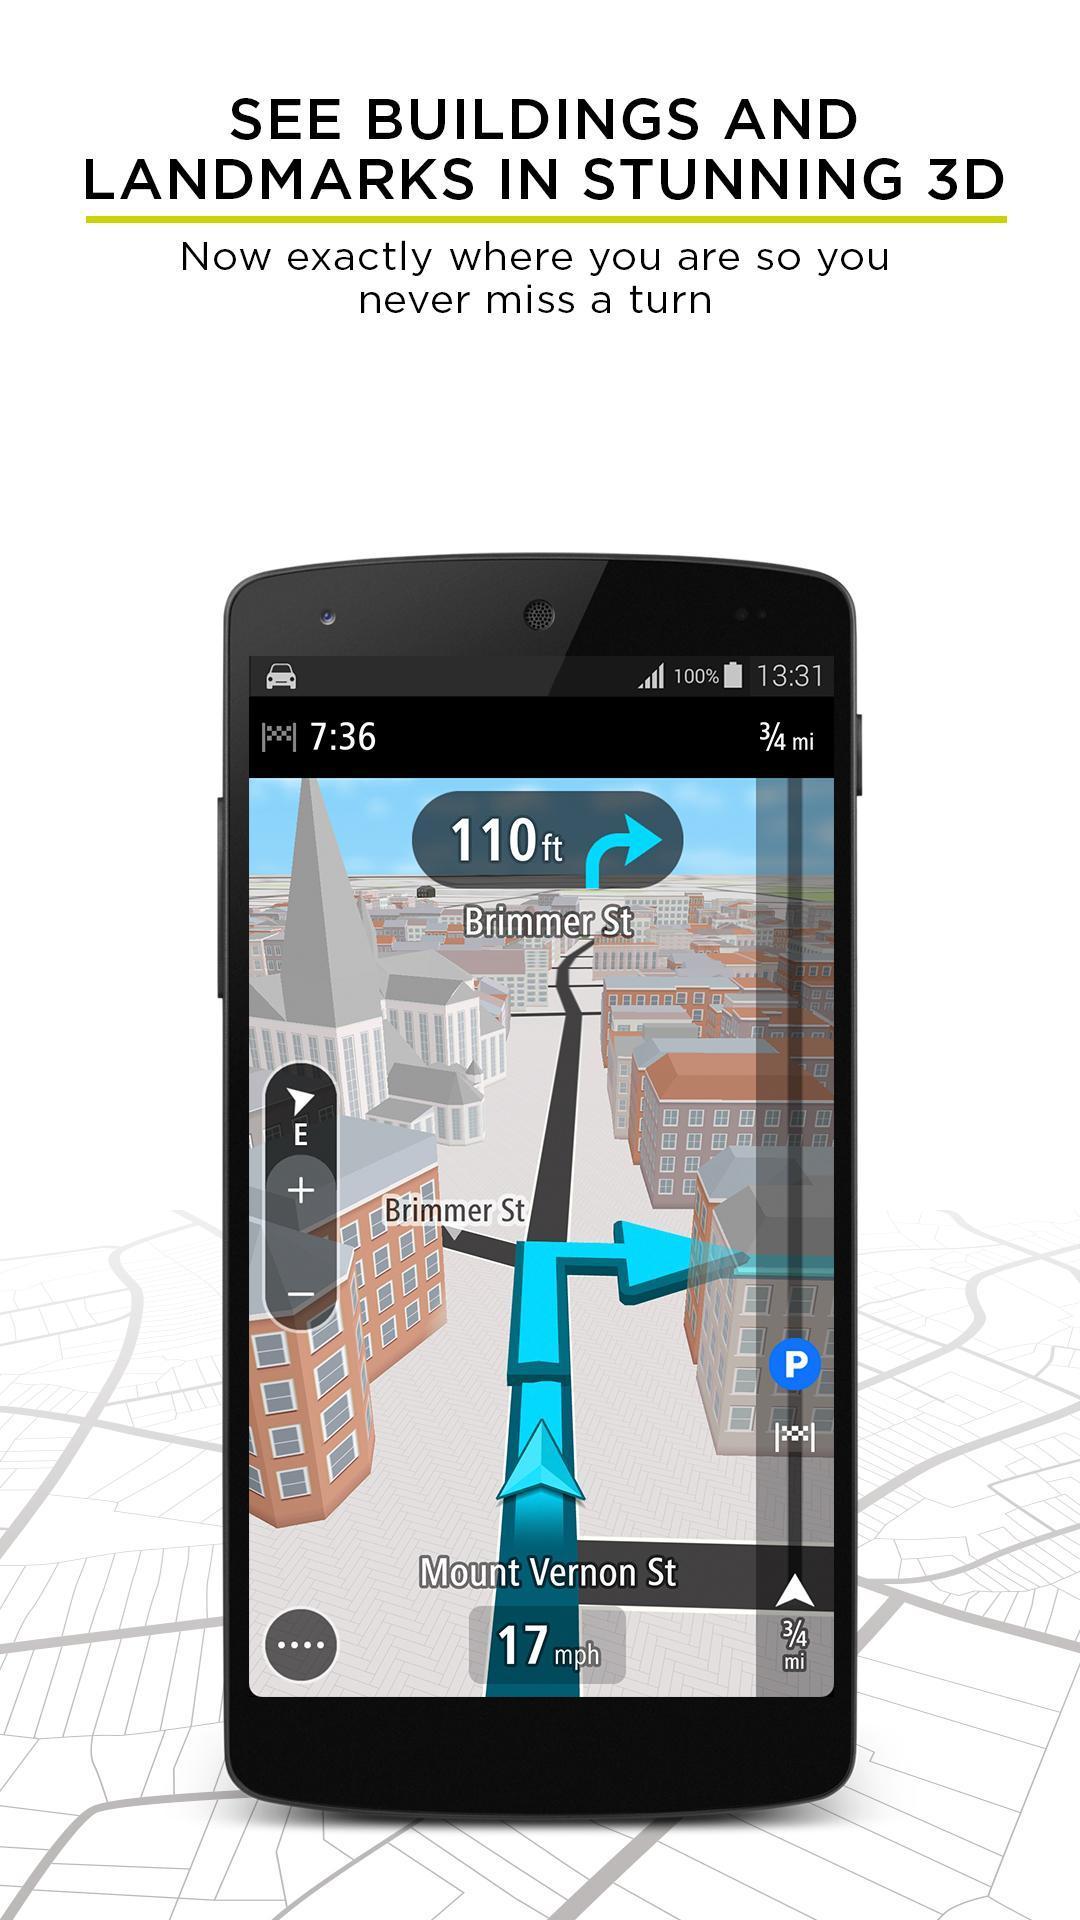 TomTom GPS Navigation - Live Traffic Alerts & Maps 2.0.4 Screenshot 4